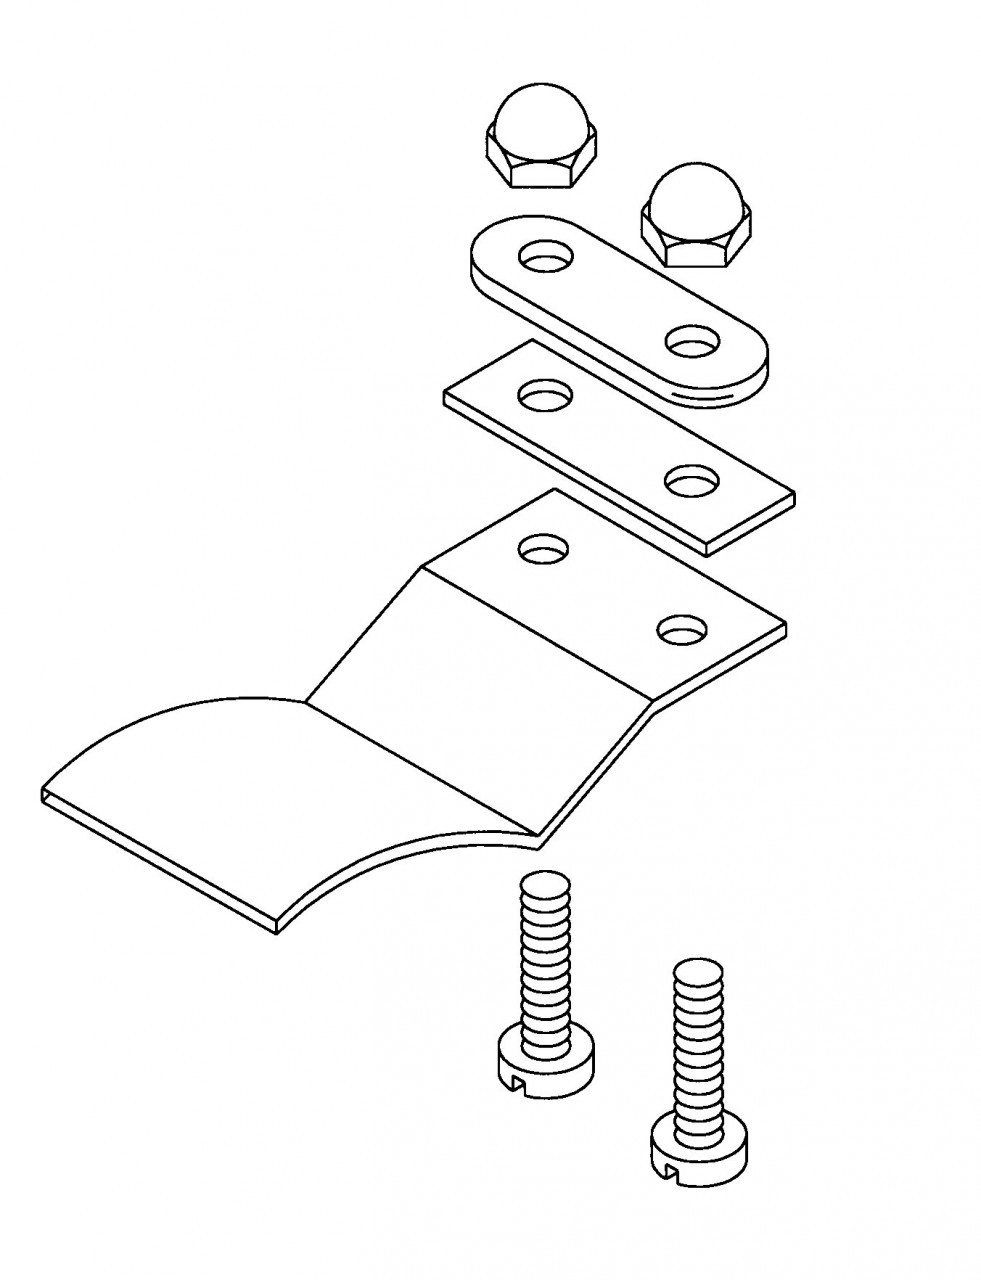 Hobart Saws - Upper Door Clip Assembly - H065A